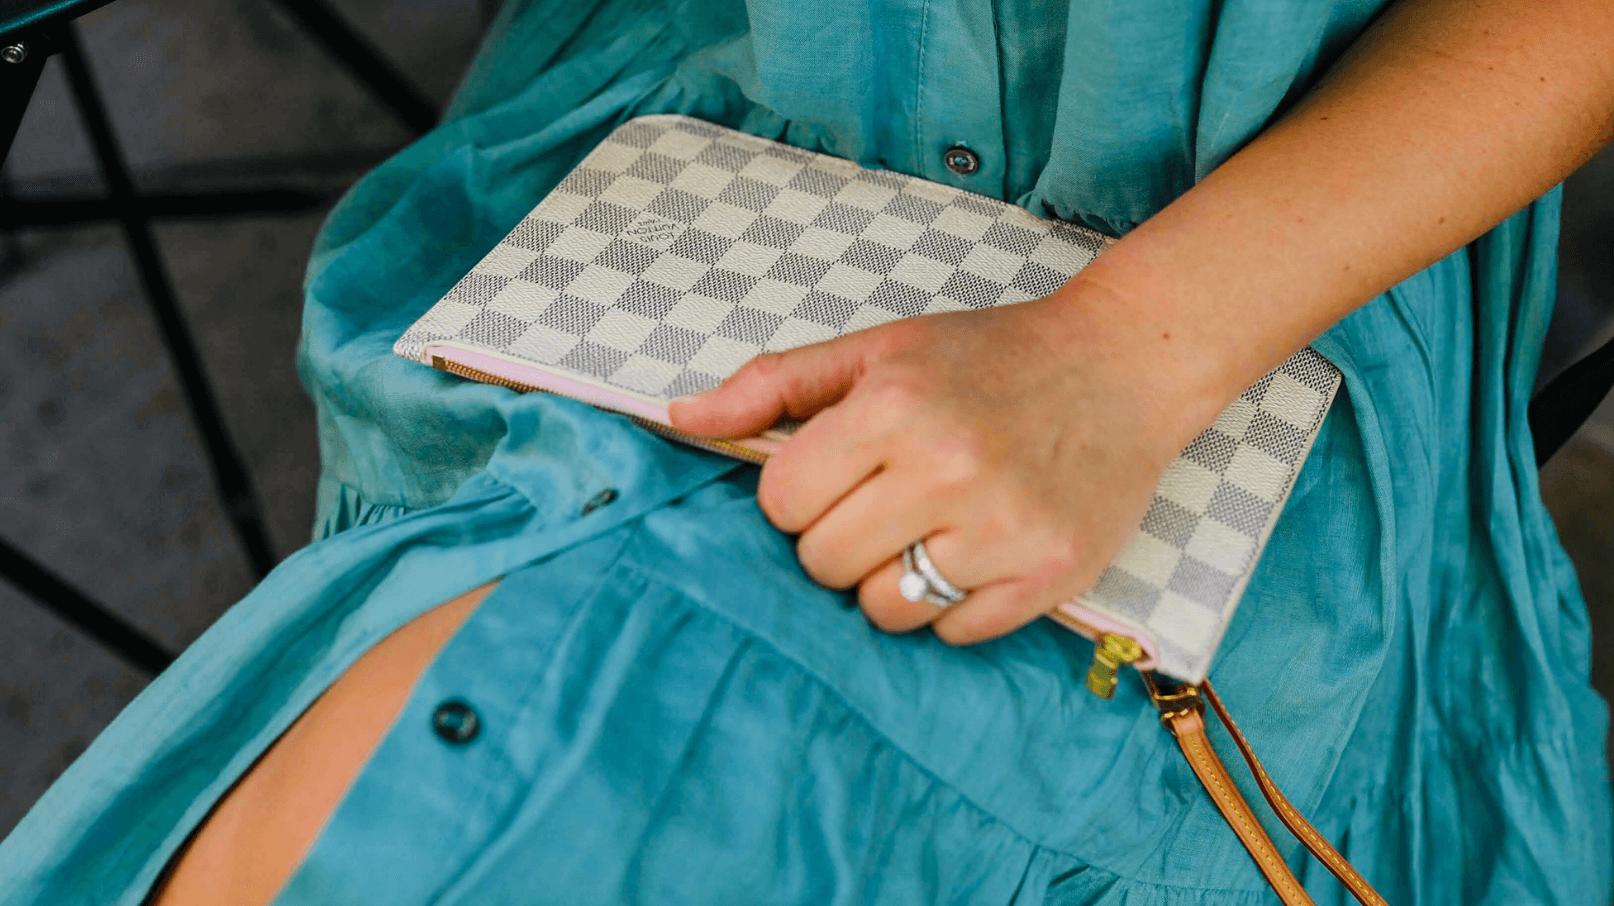 Sea Dress Margaux Shoes Louis Vuitton Wristlet Outfit by Modnitsa Styling